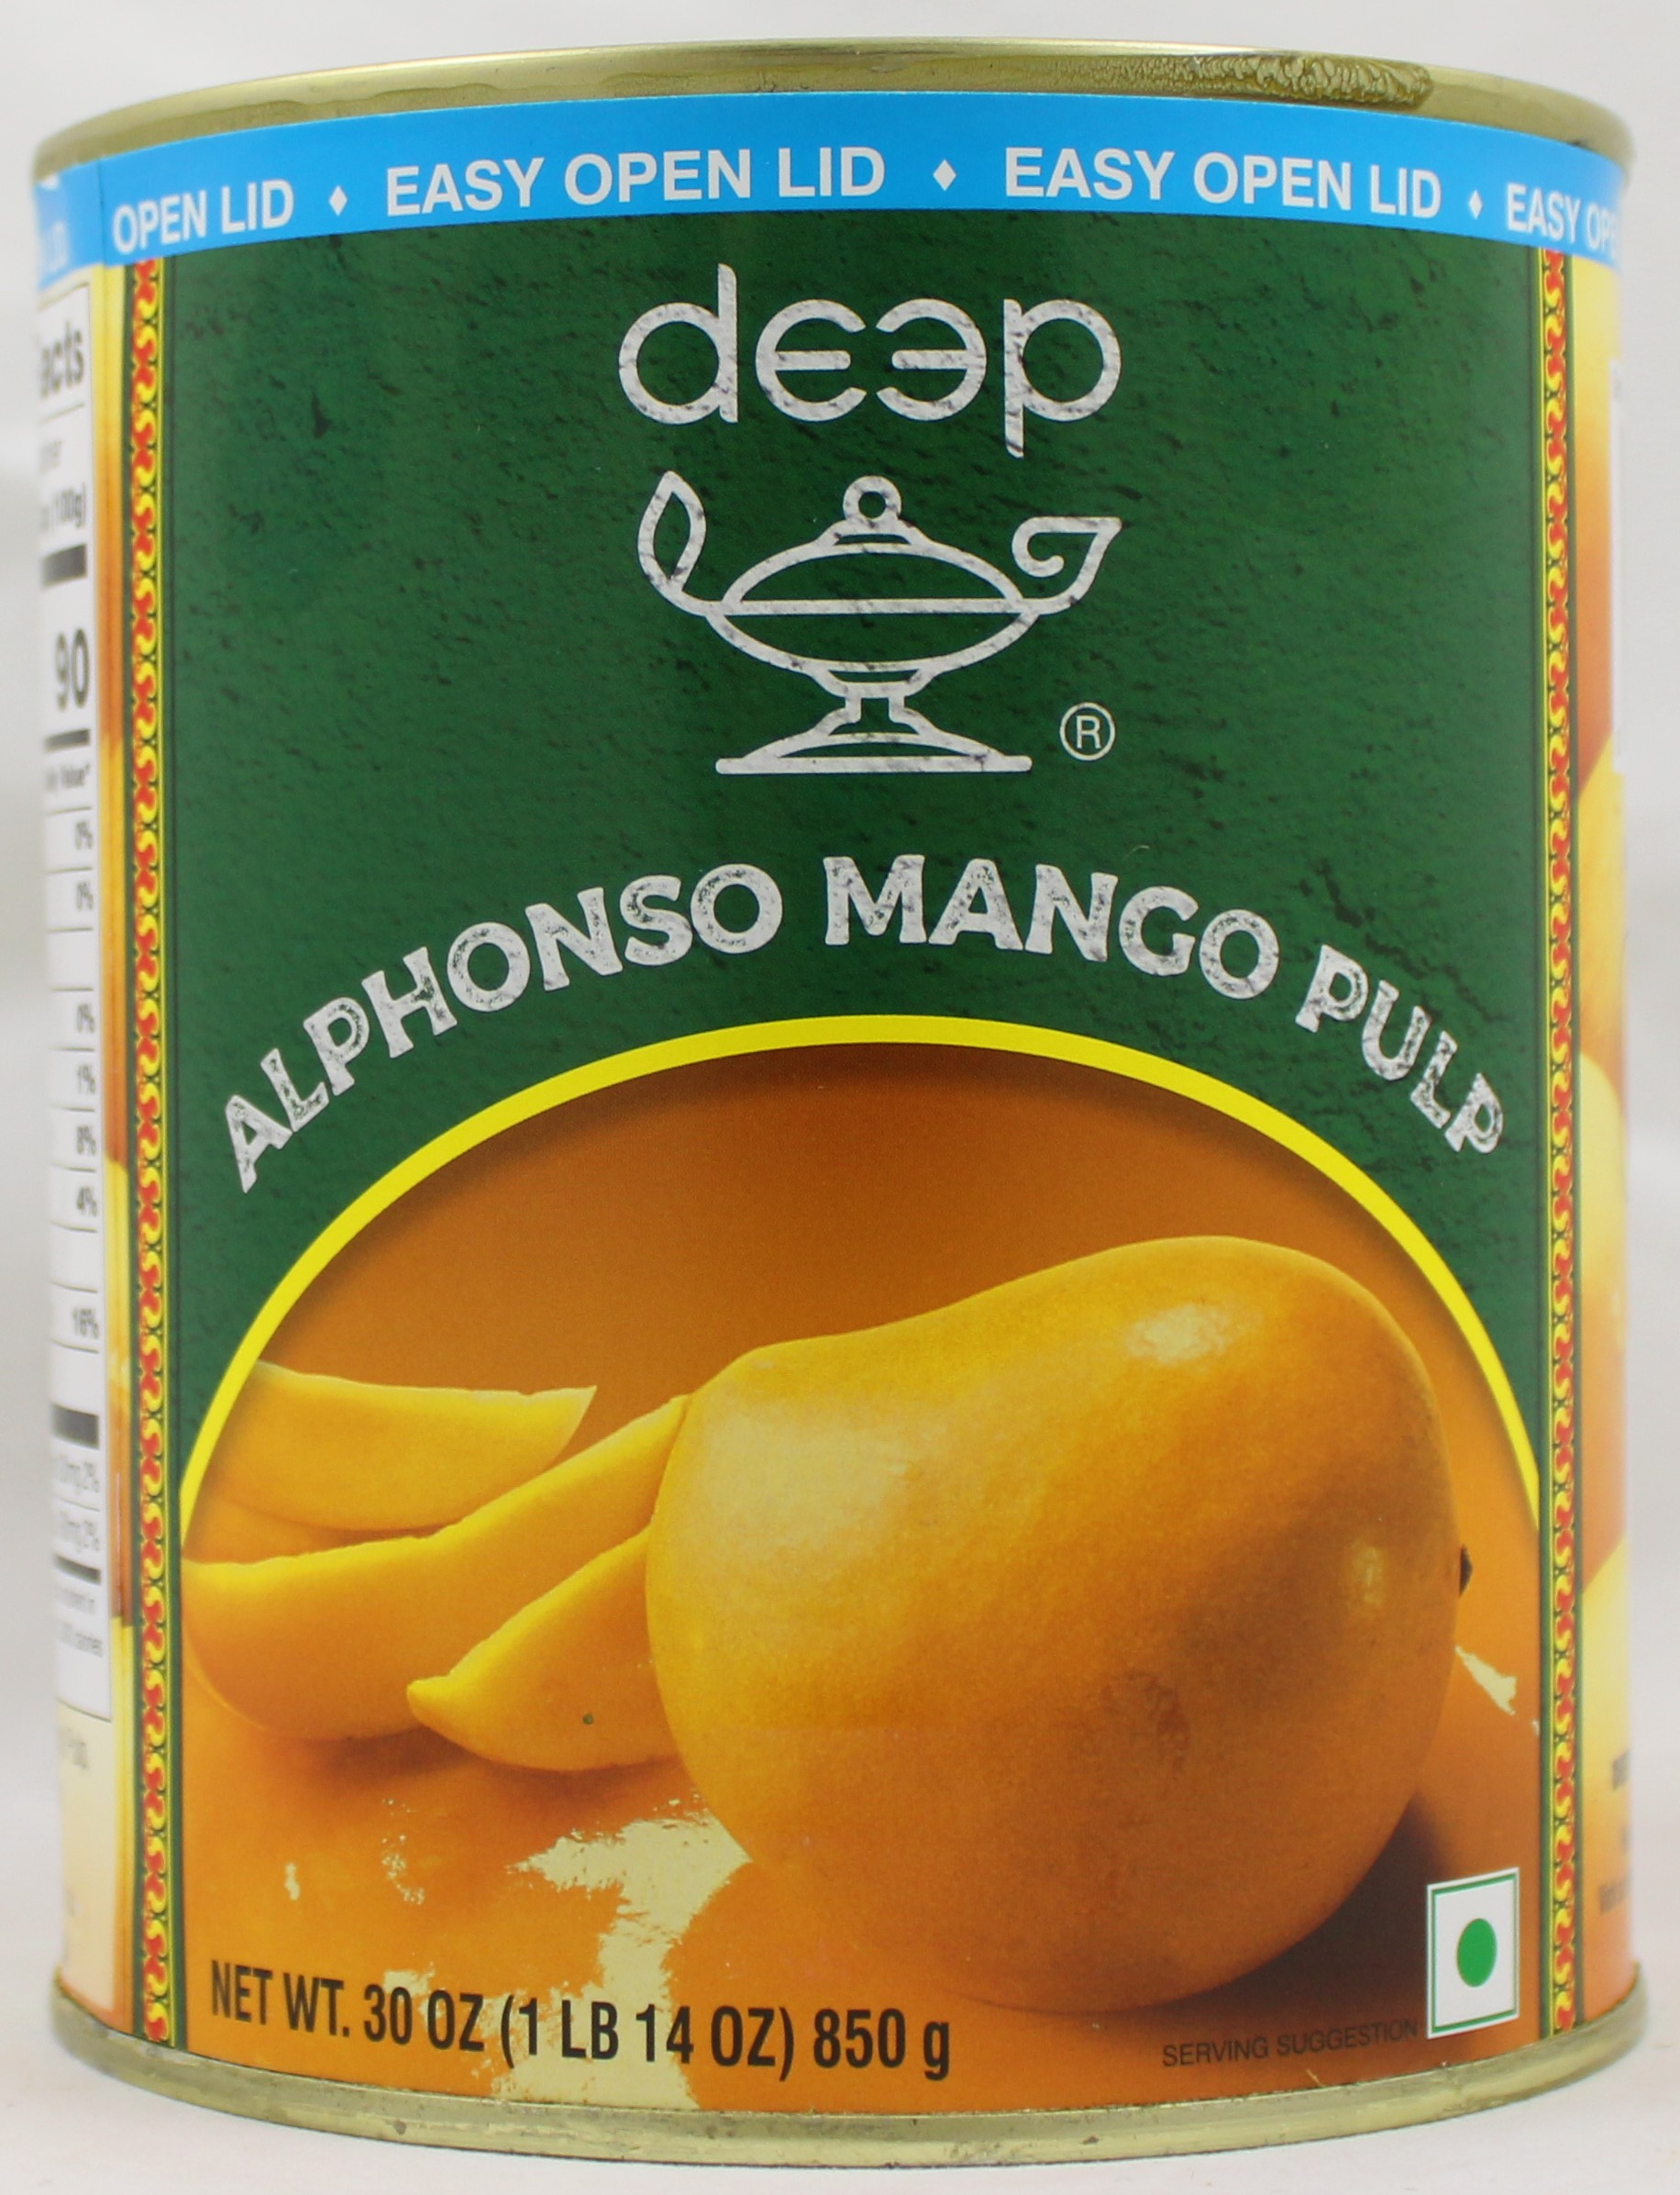 Alphonso Mango Pulp30oz EasyOpenLid